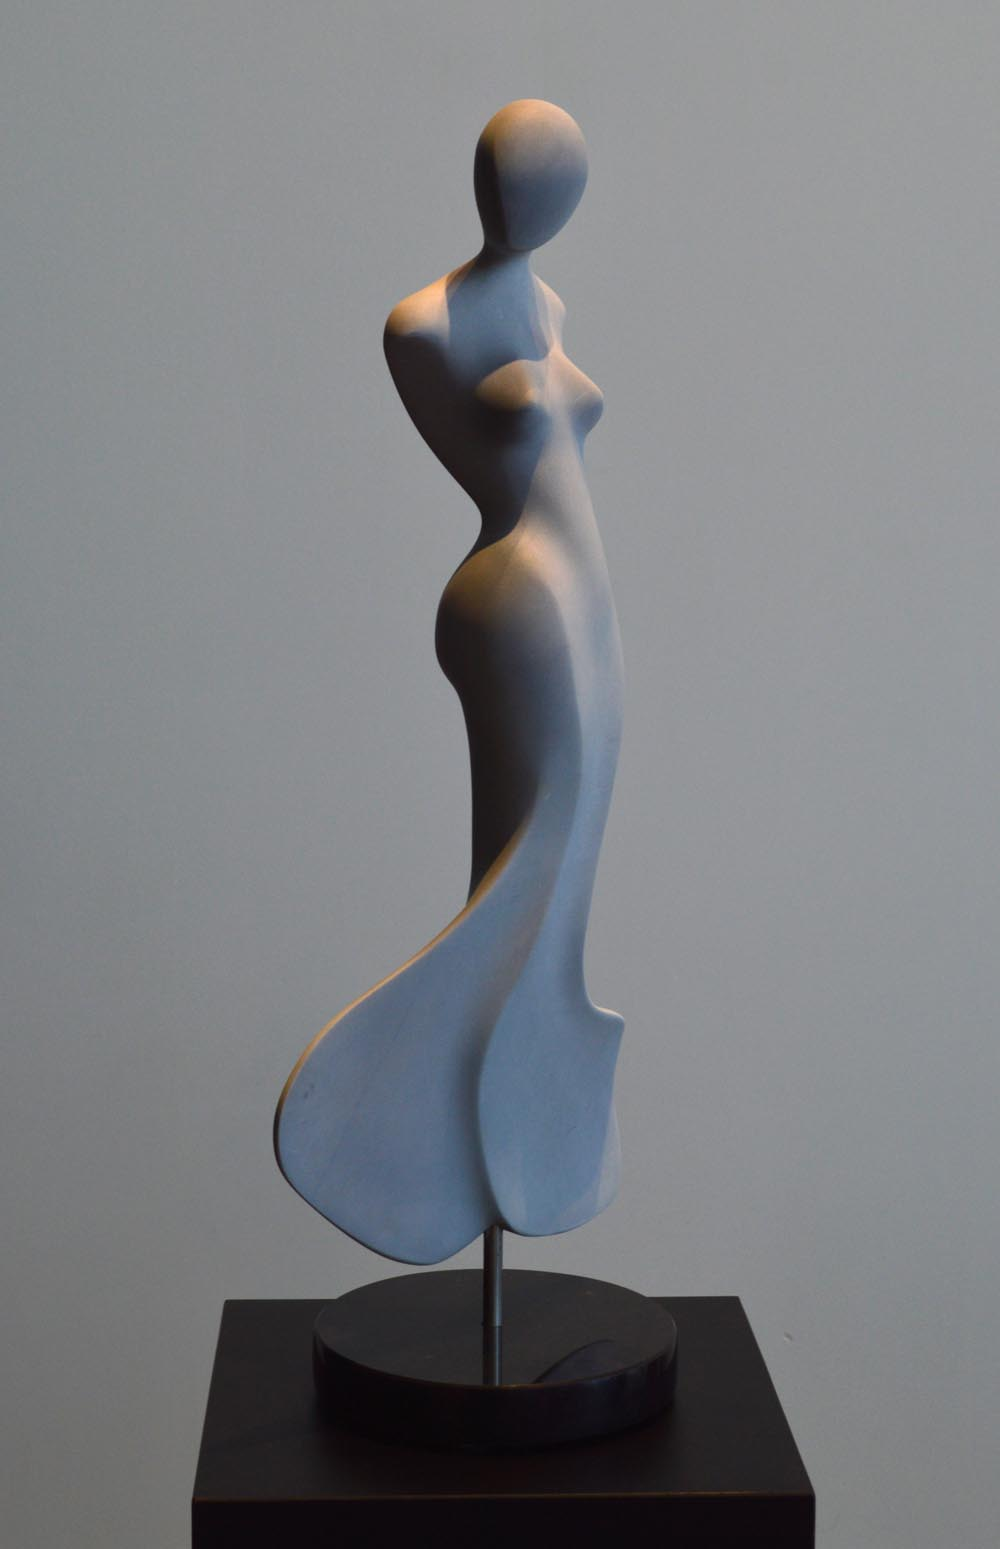 michael binkley sculptor stone sculpture female nude fine art marble vancouver canada